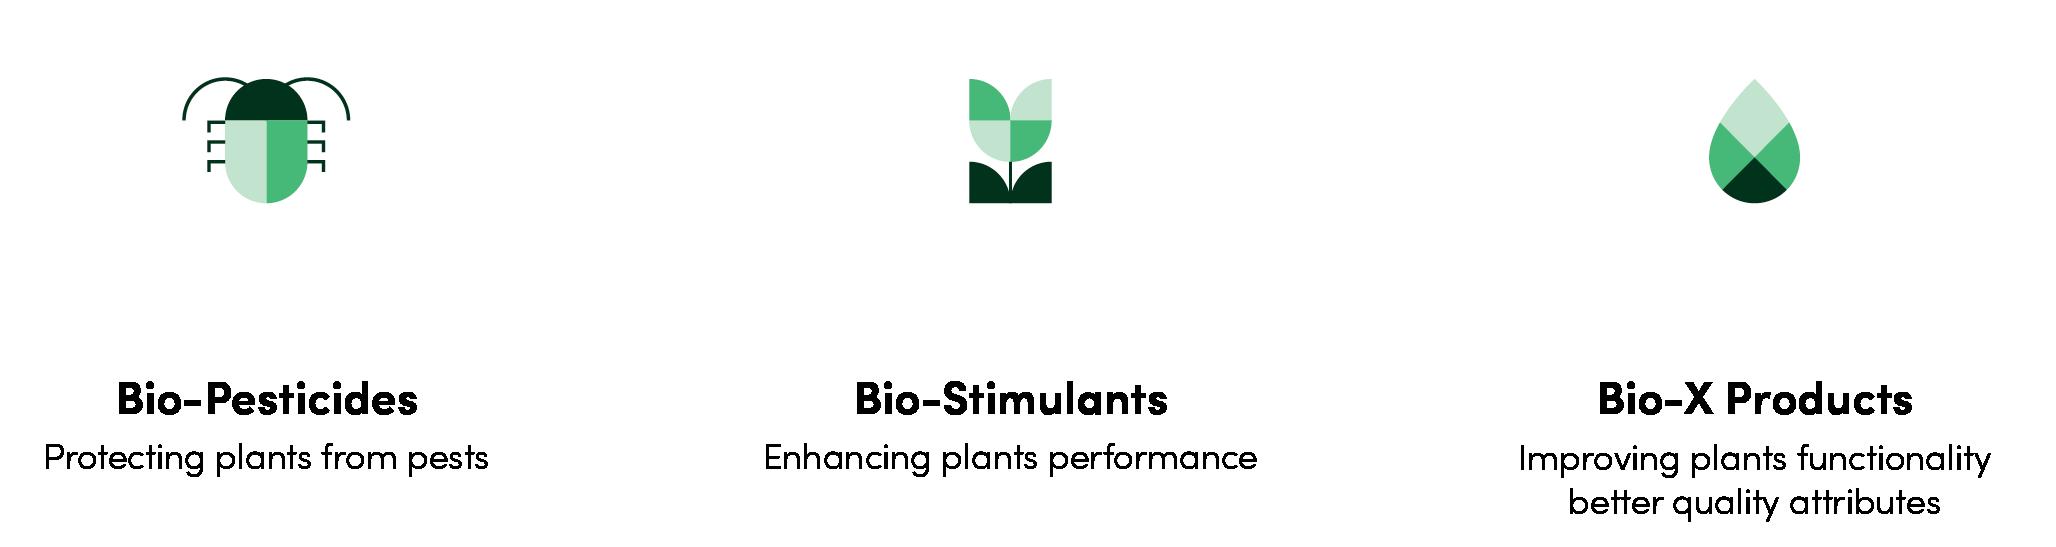 Lavie Bio products — Bio-Pesticides, Bio-Stimulants and Bio-X Products